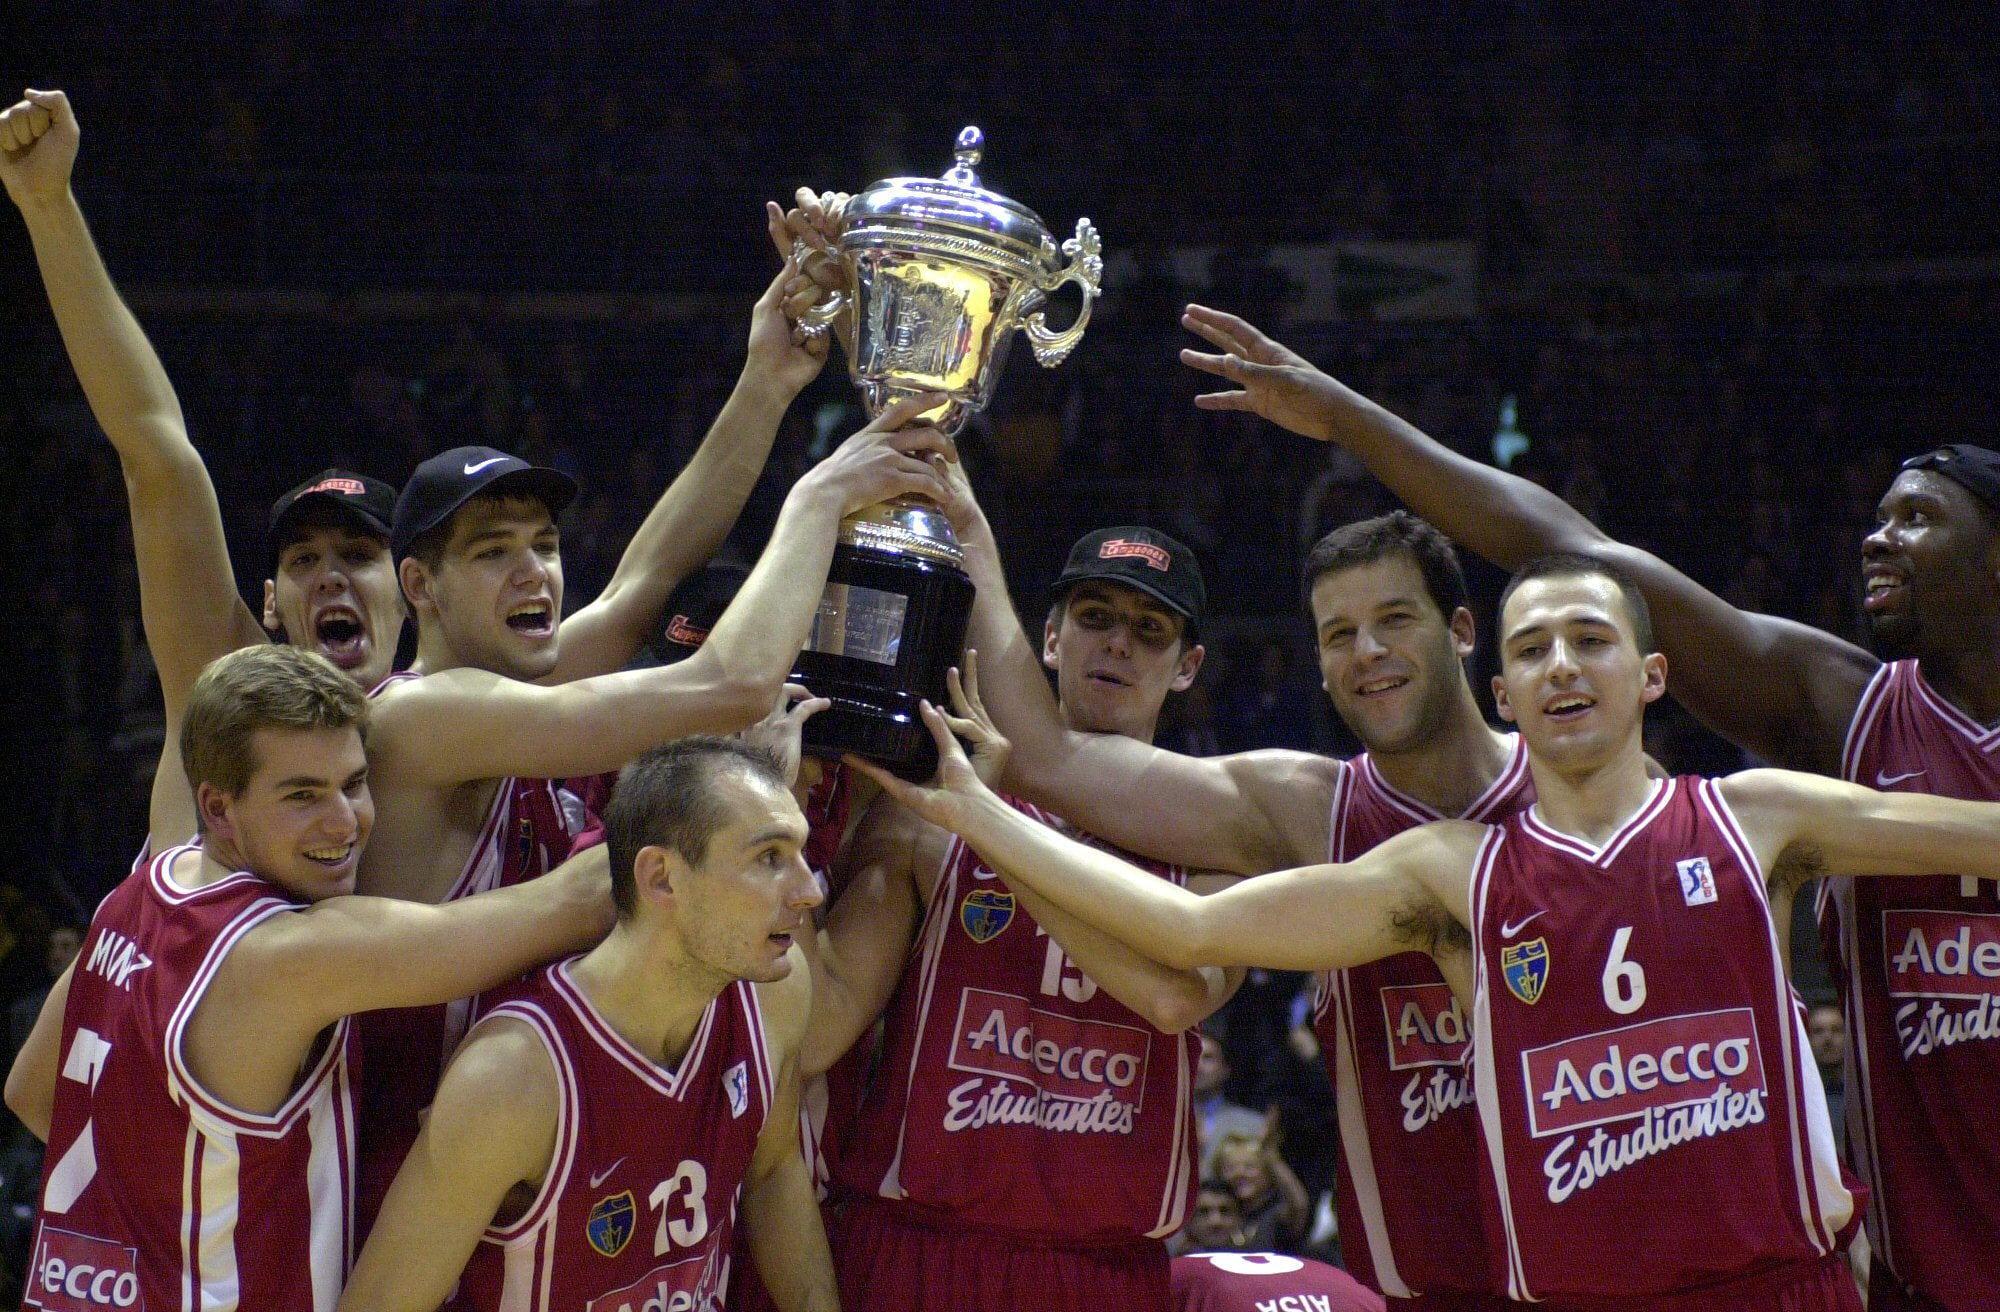 31 de enero de 2000, Vitoria-Gasteiz…